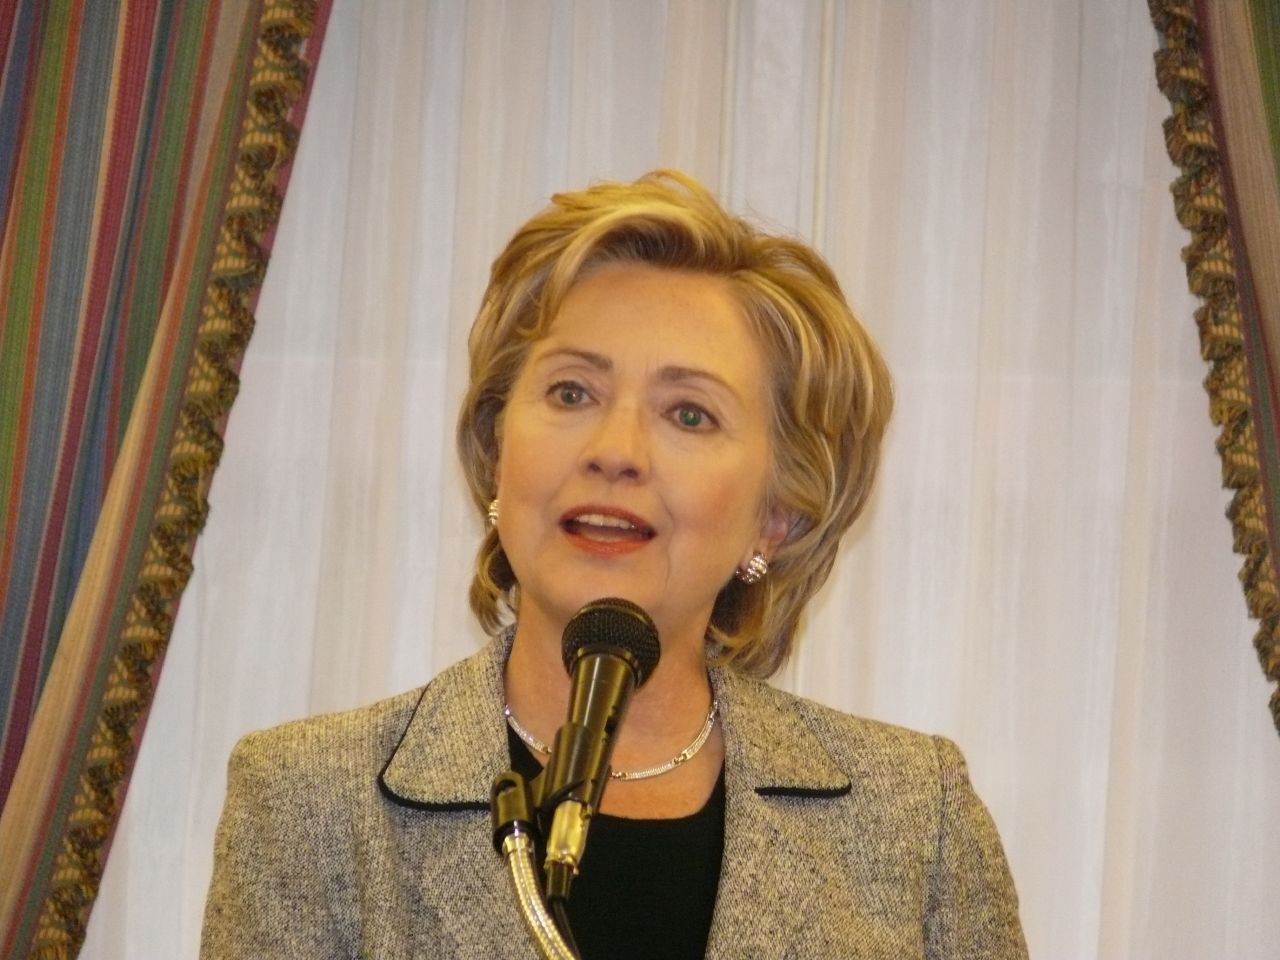 Hillary Asked Whether Juanita Broaddrick Kathleen Willey And Paula